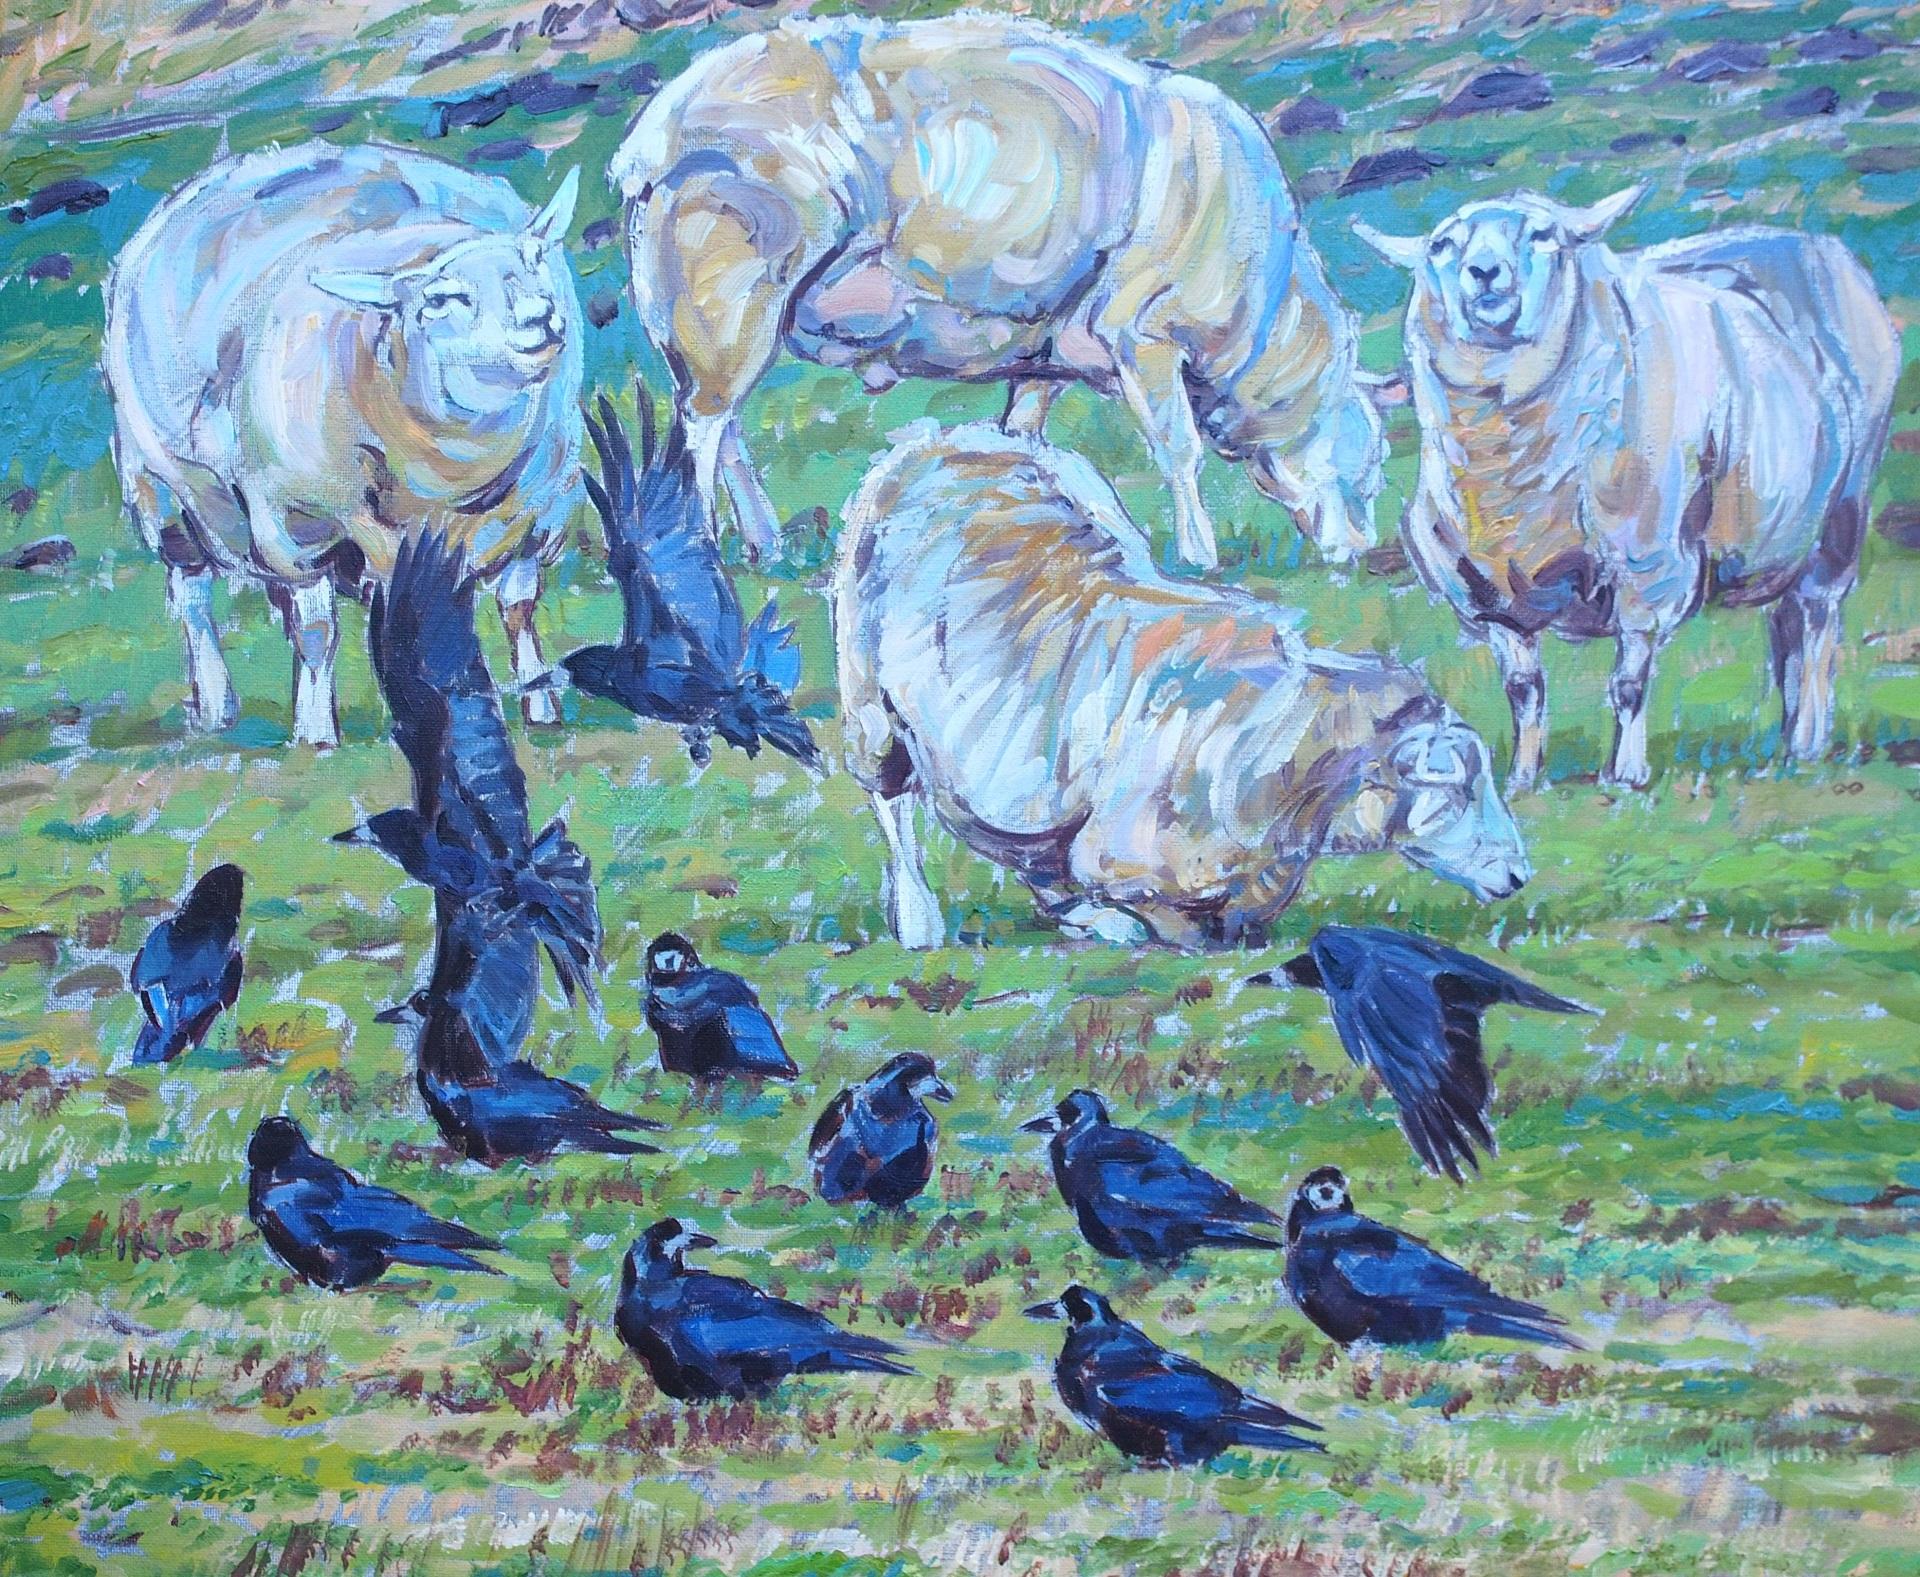 Rooks and Sheep